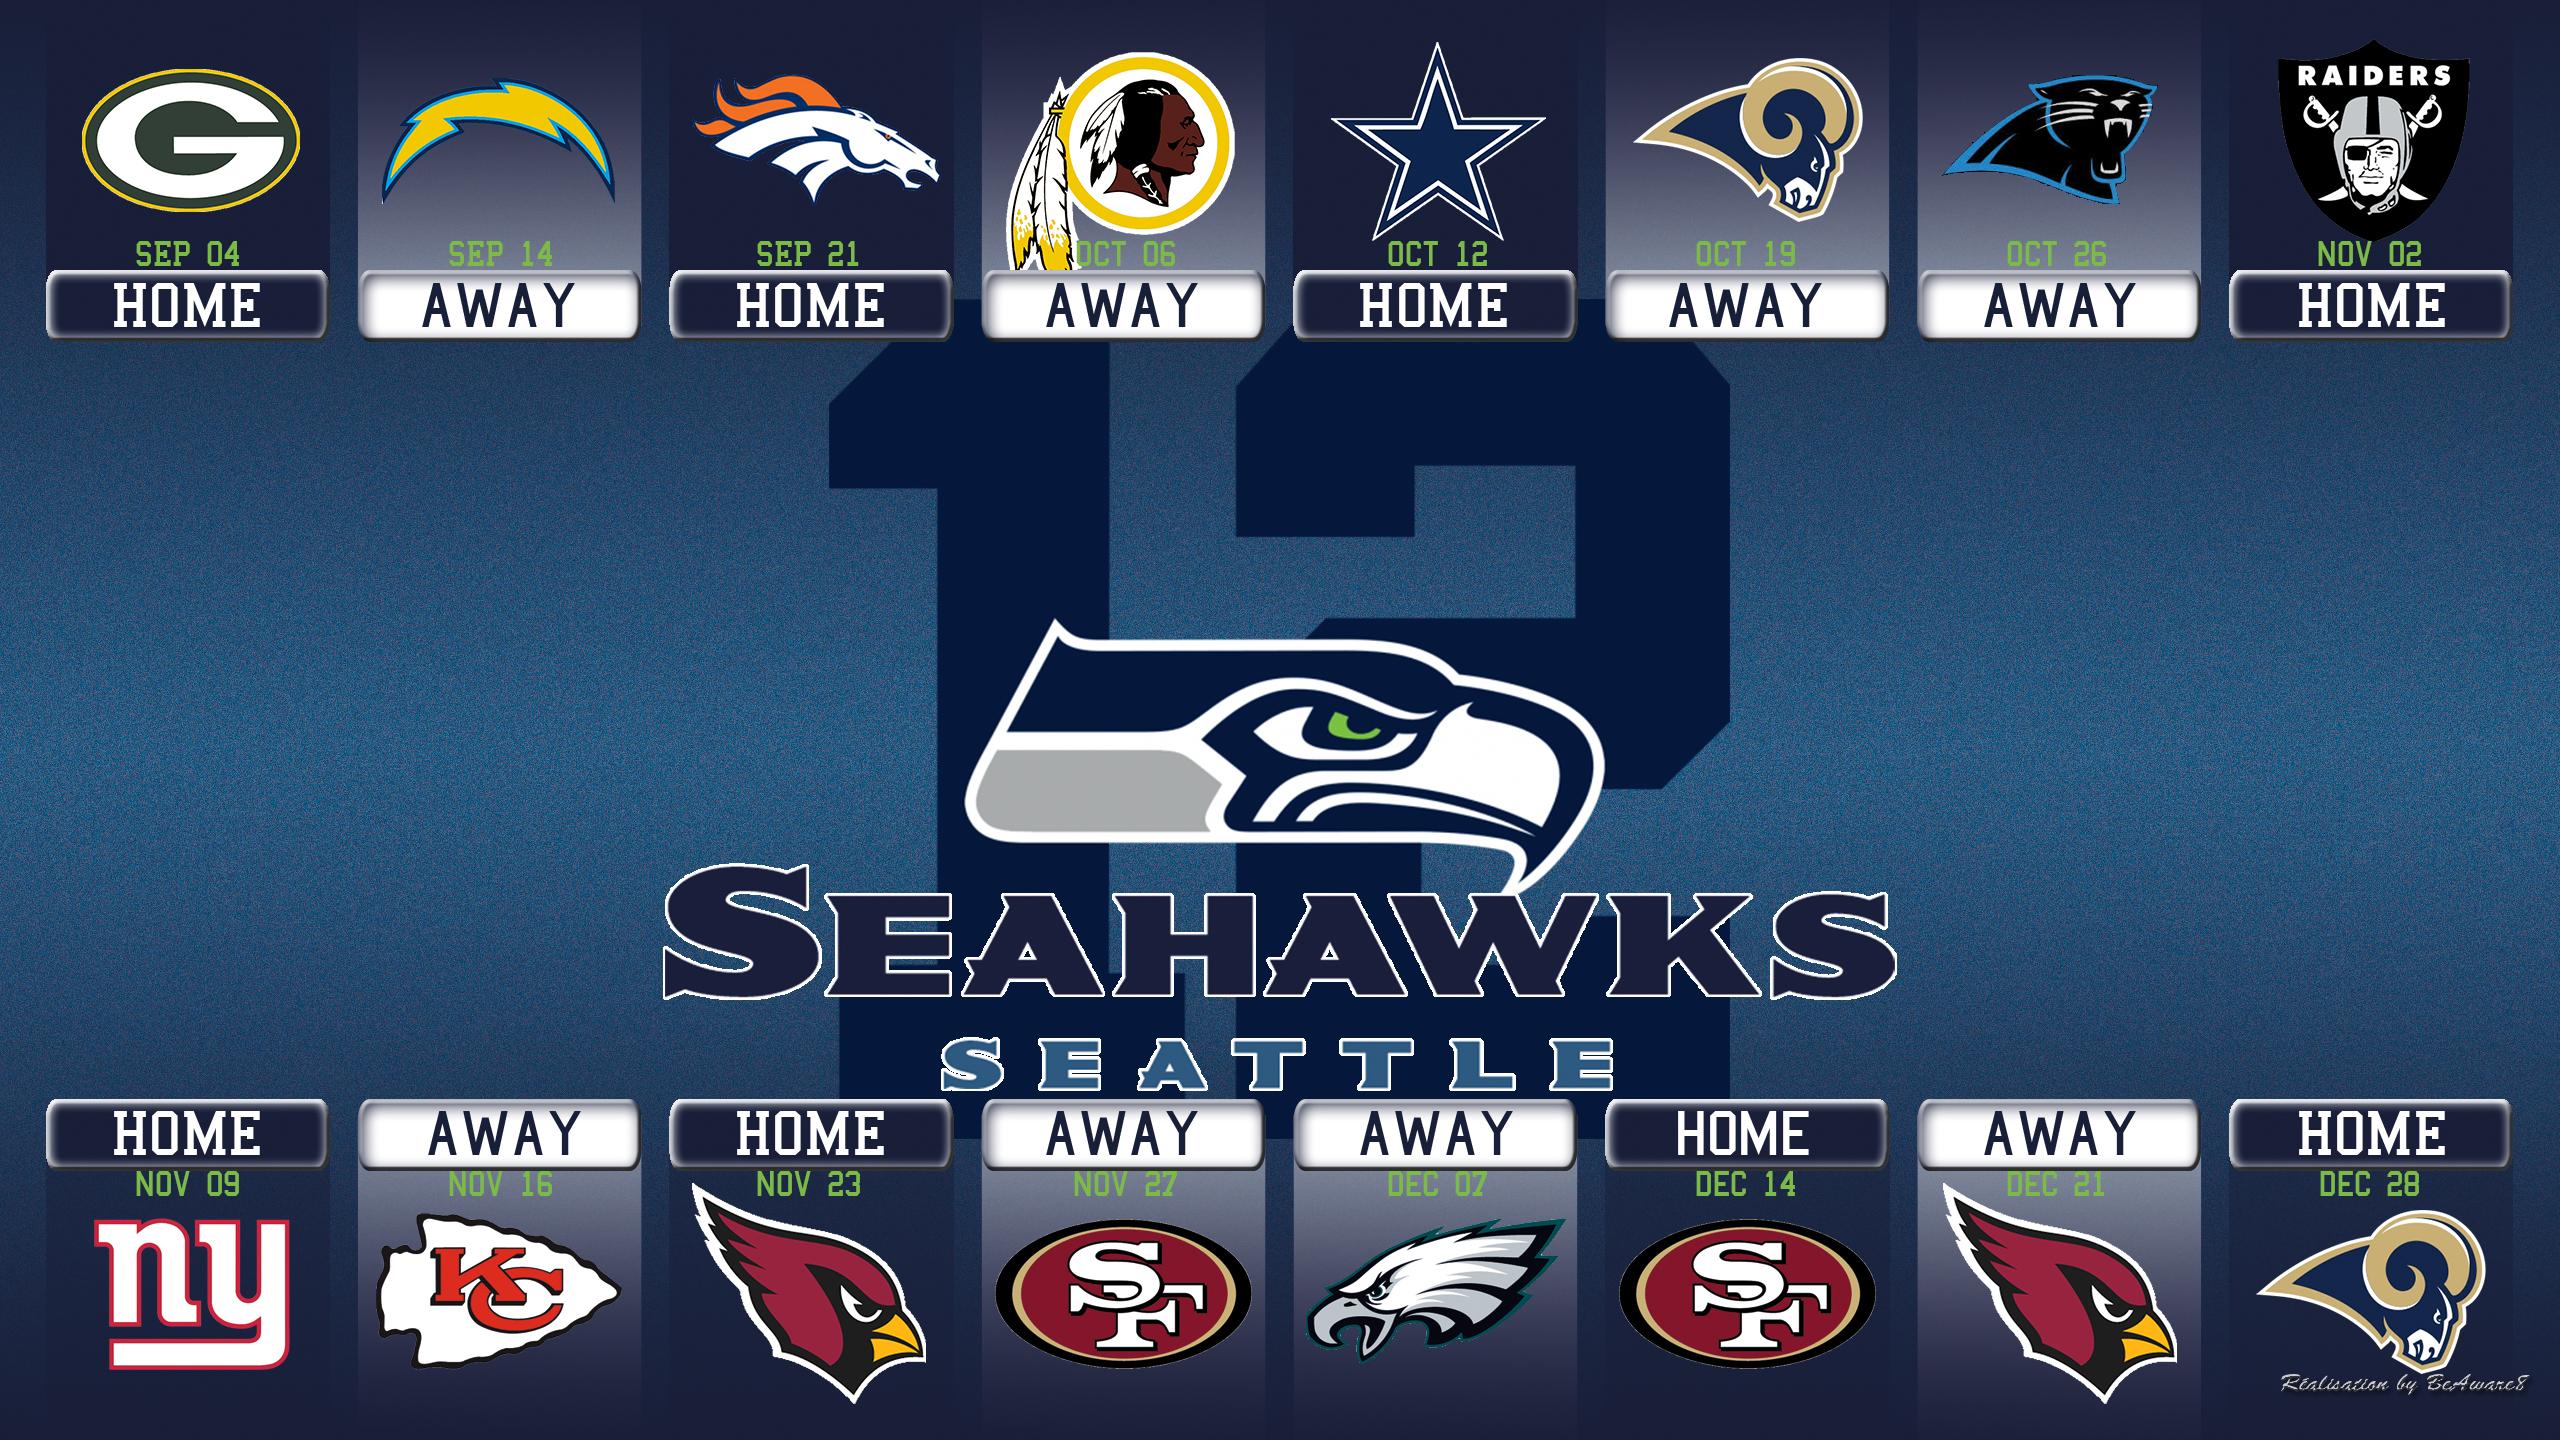 Seattle Seahawks Calandar Saison 2014 By Beaware8 On